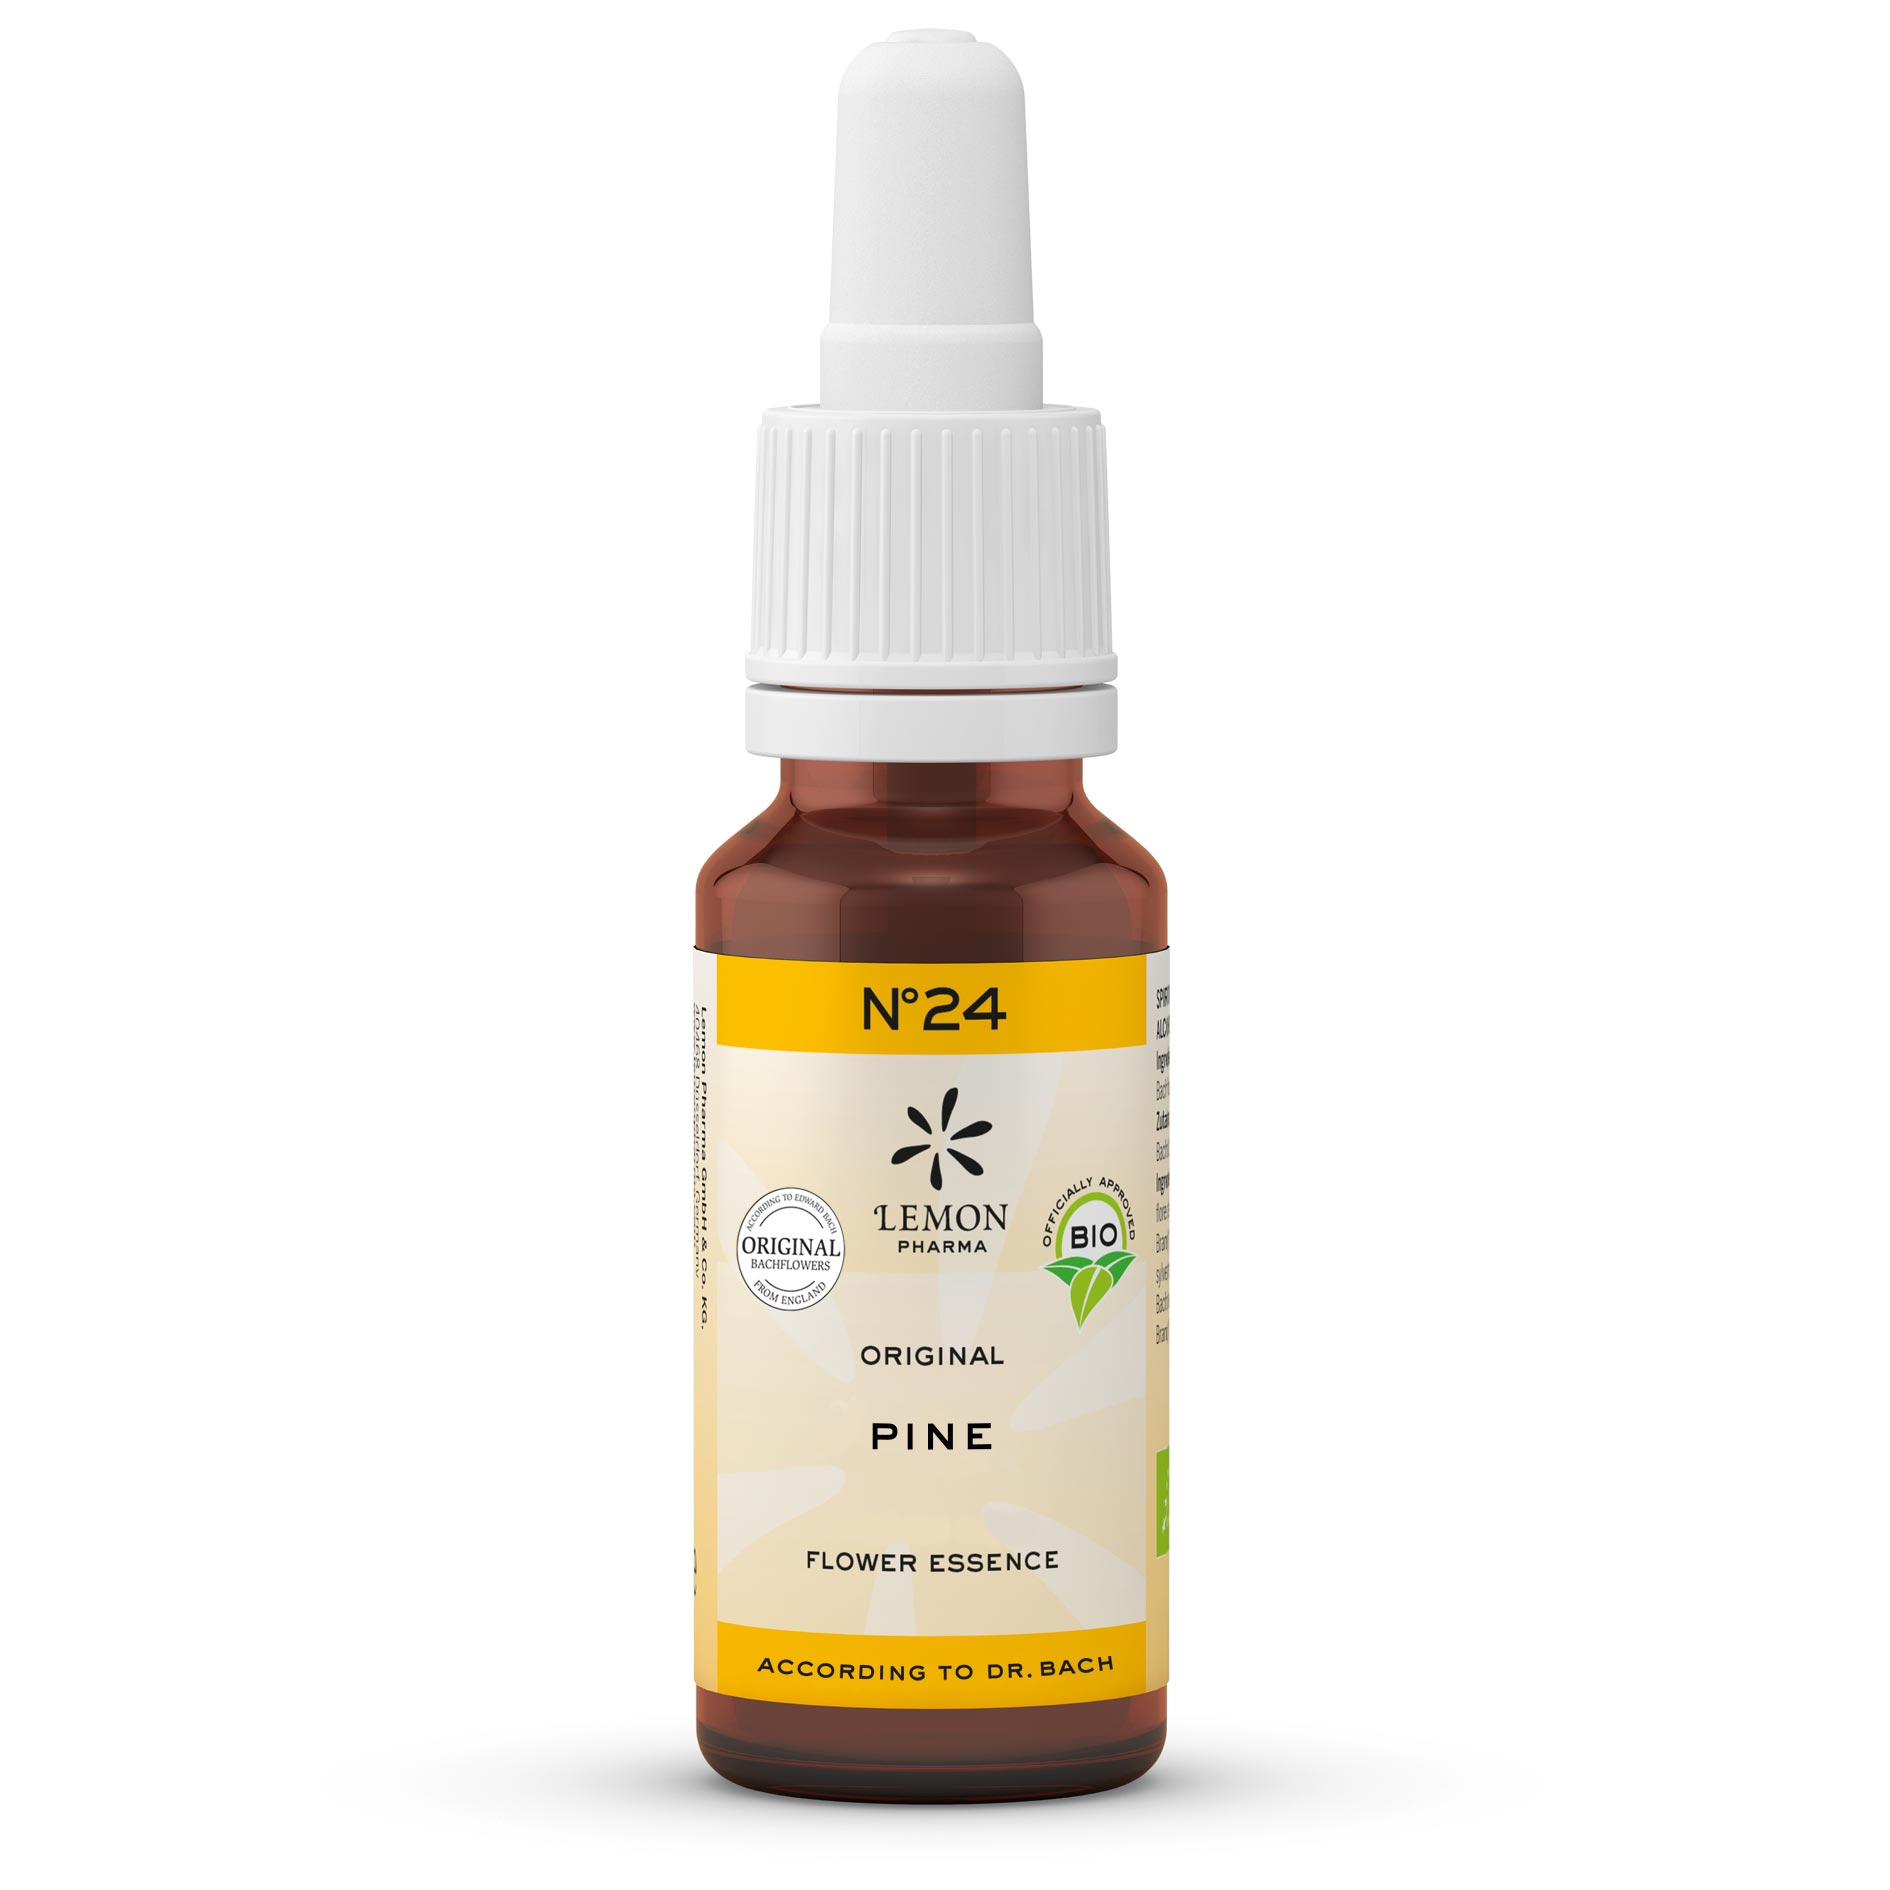 Lemon Pharma Gouttes Fleurs de Bach Original n°24 Pine Pin sylvestre Pardon